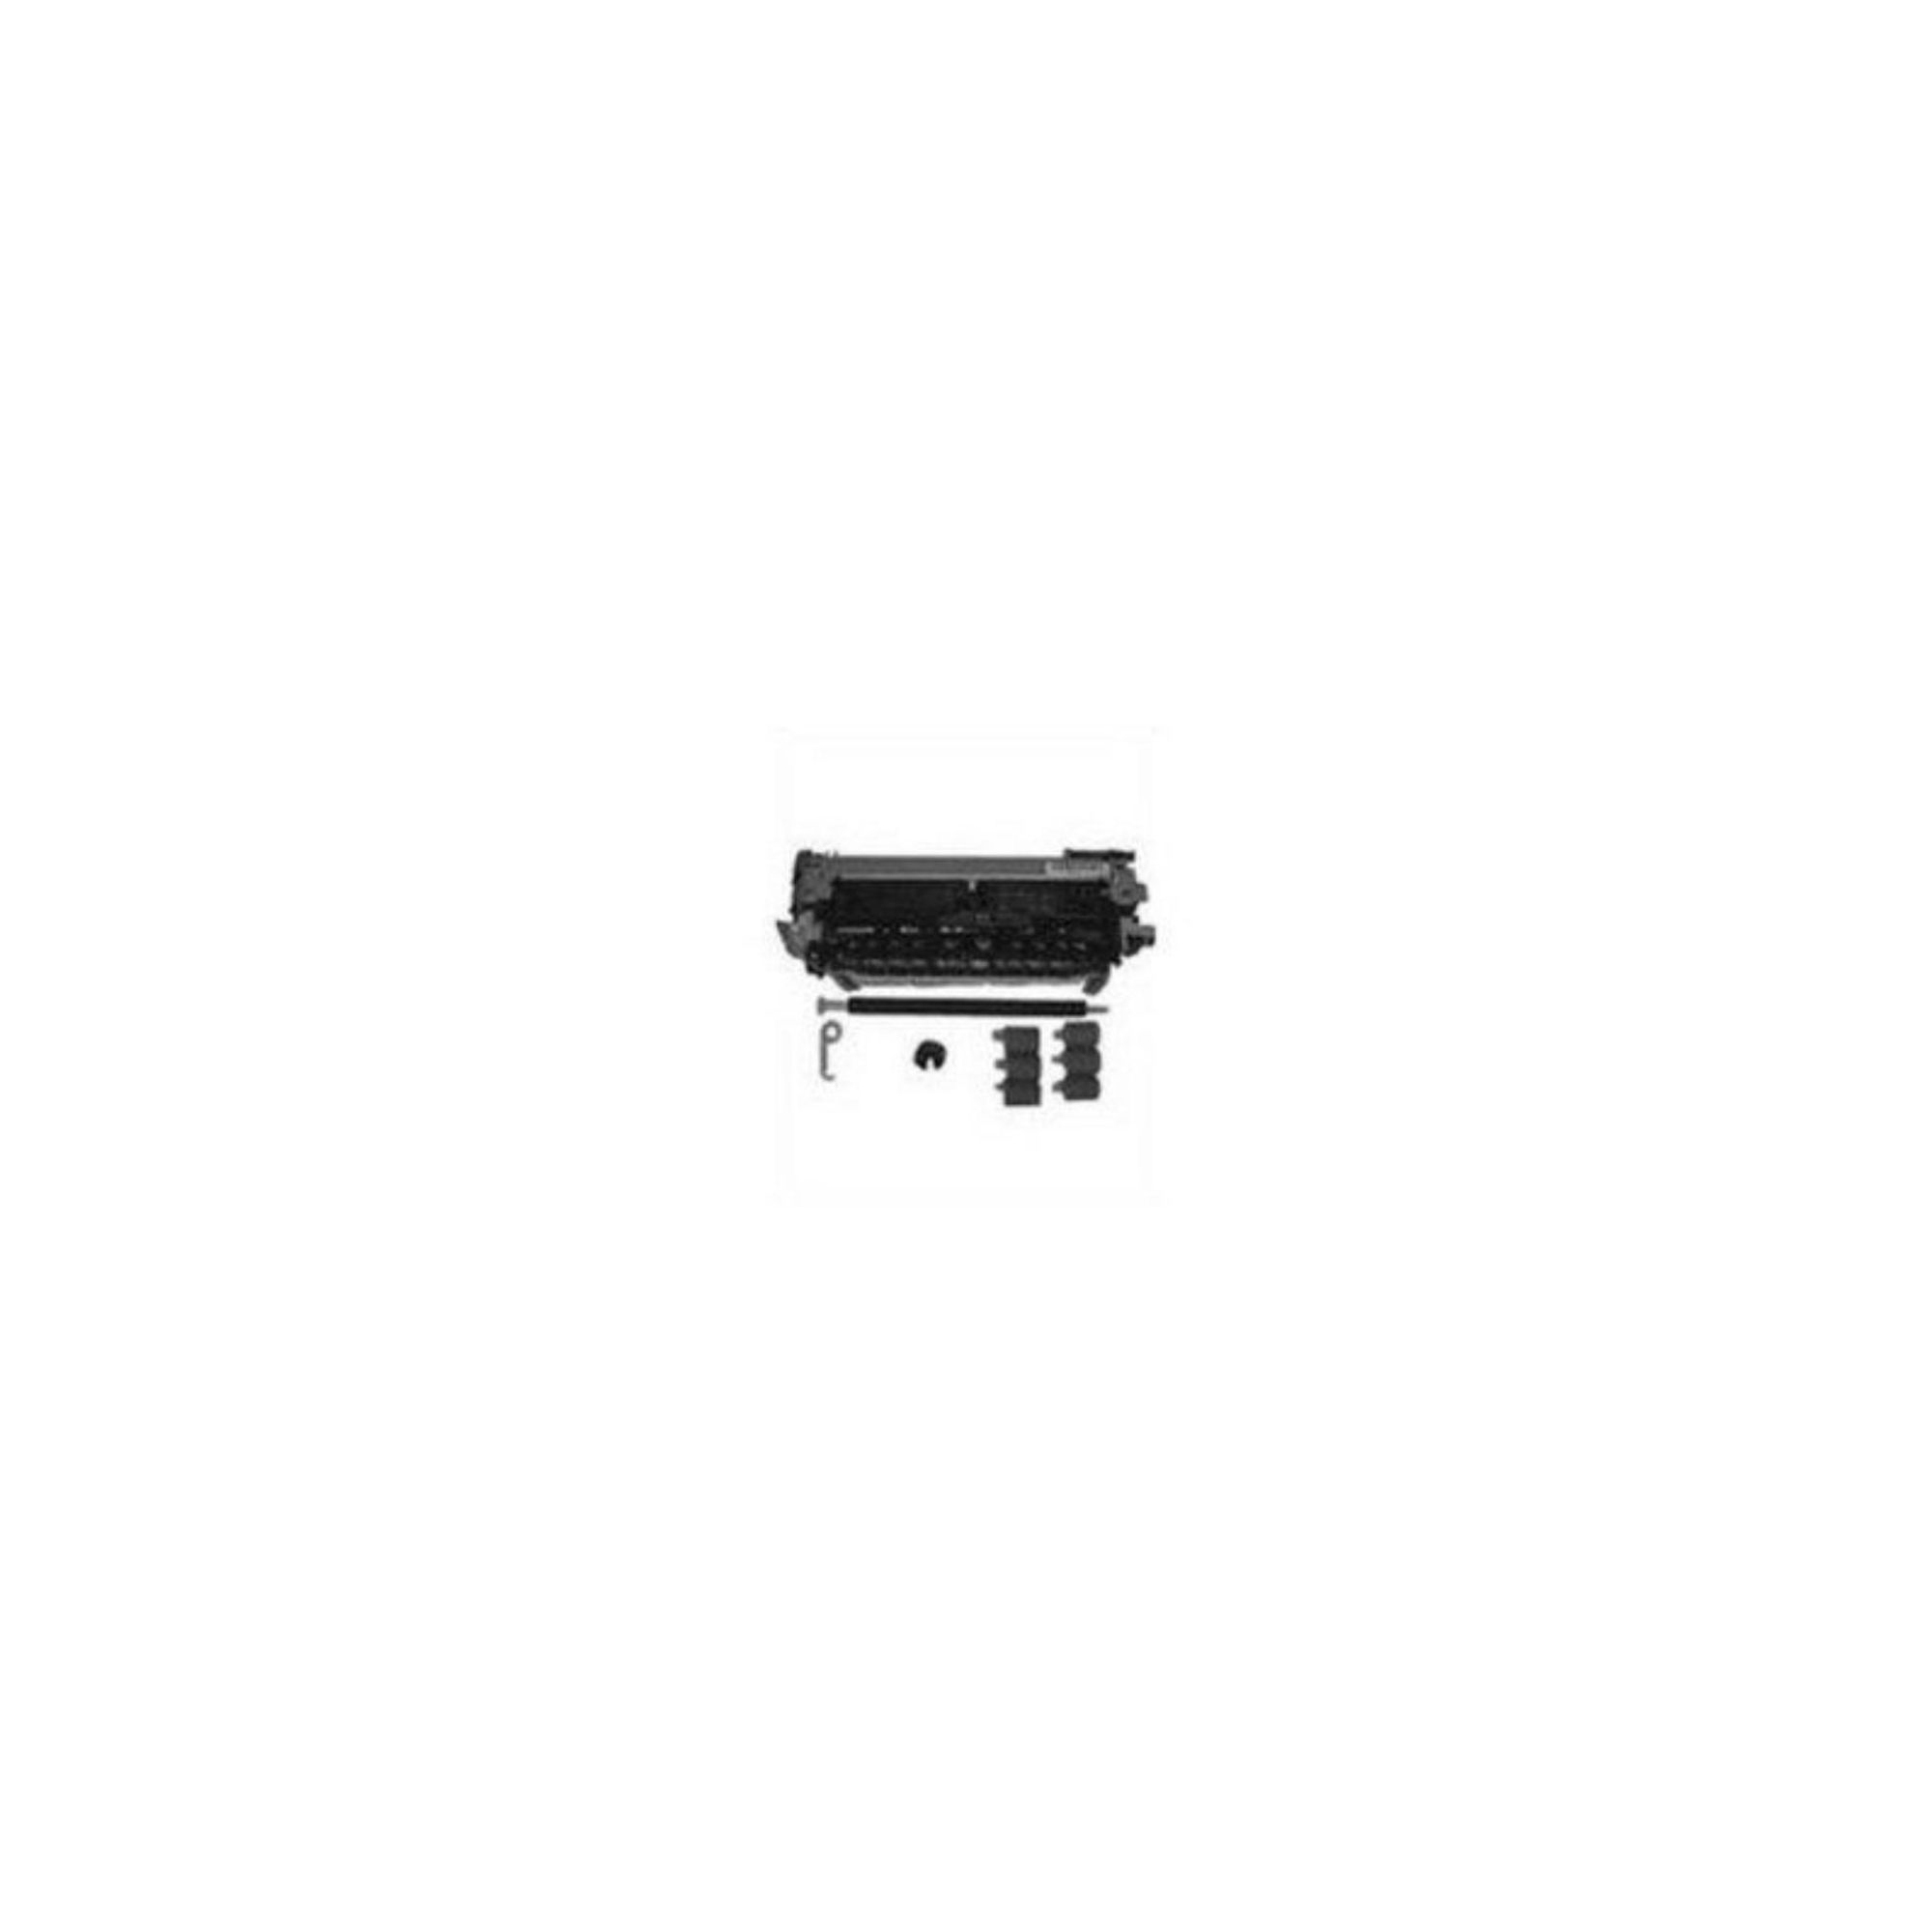 Kyocera FS-4000DN Maintenance Kit MK320 at Tesco Direct